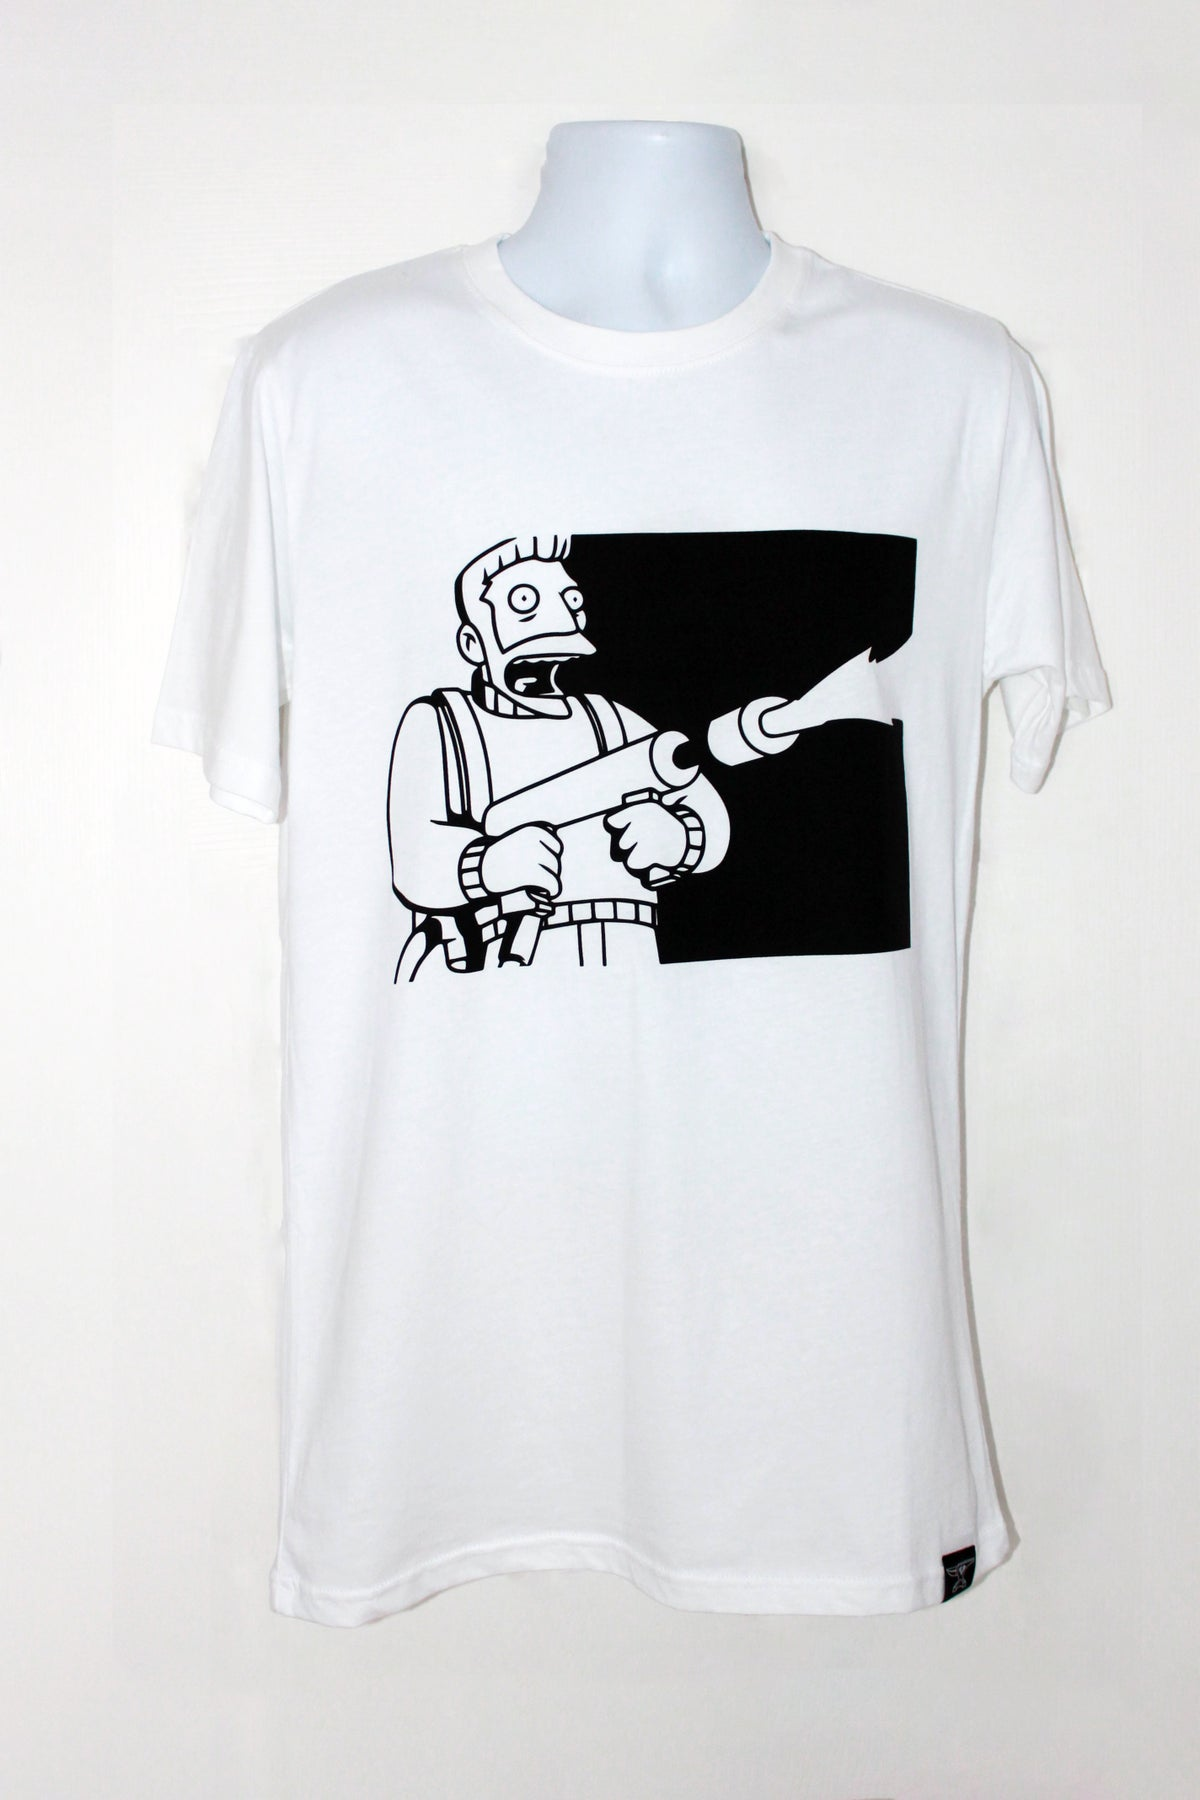 Hank Scorpio Tshirt